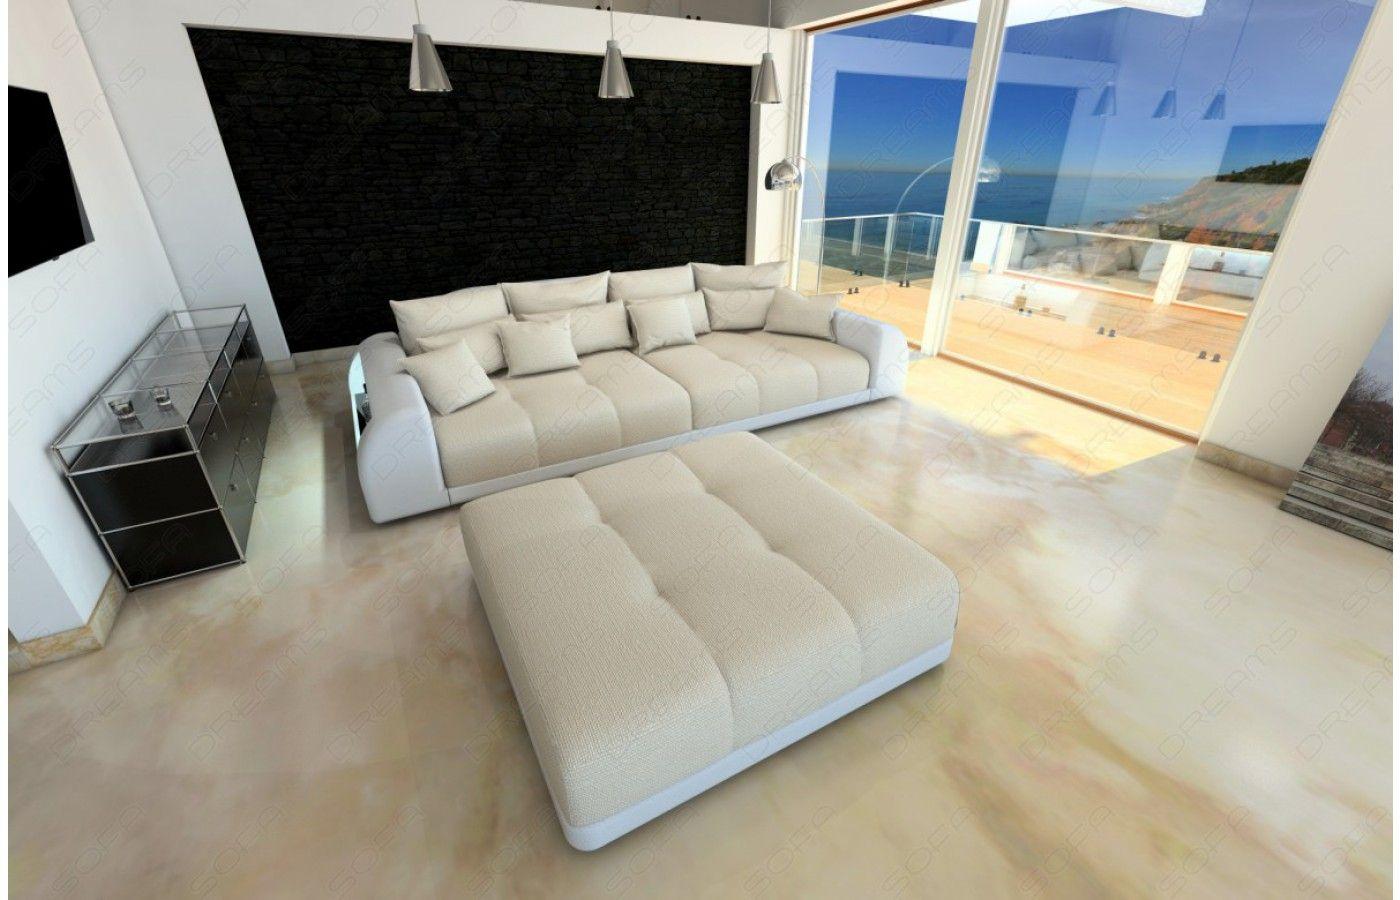 Exklusive Sofas Und Couches design bigsofa mit led beleuchtung exklusiv bei sofa dreams